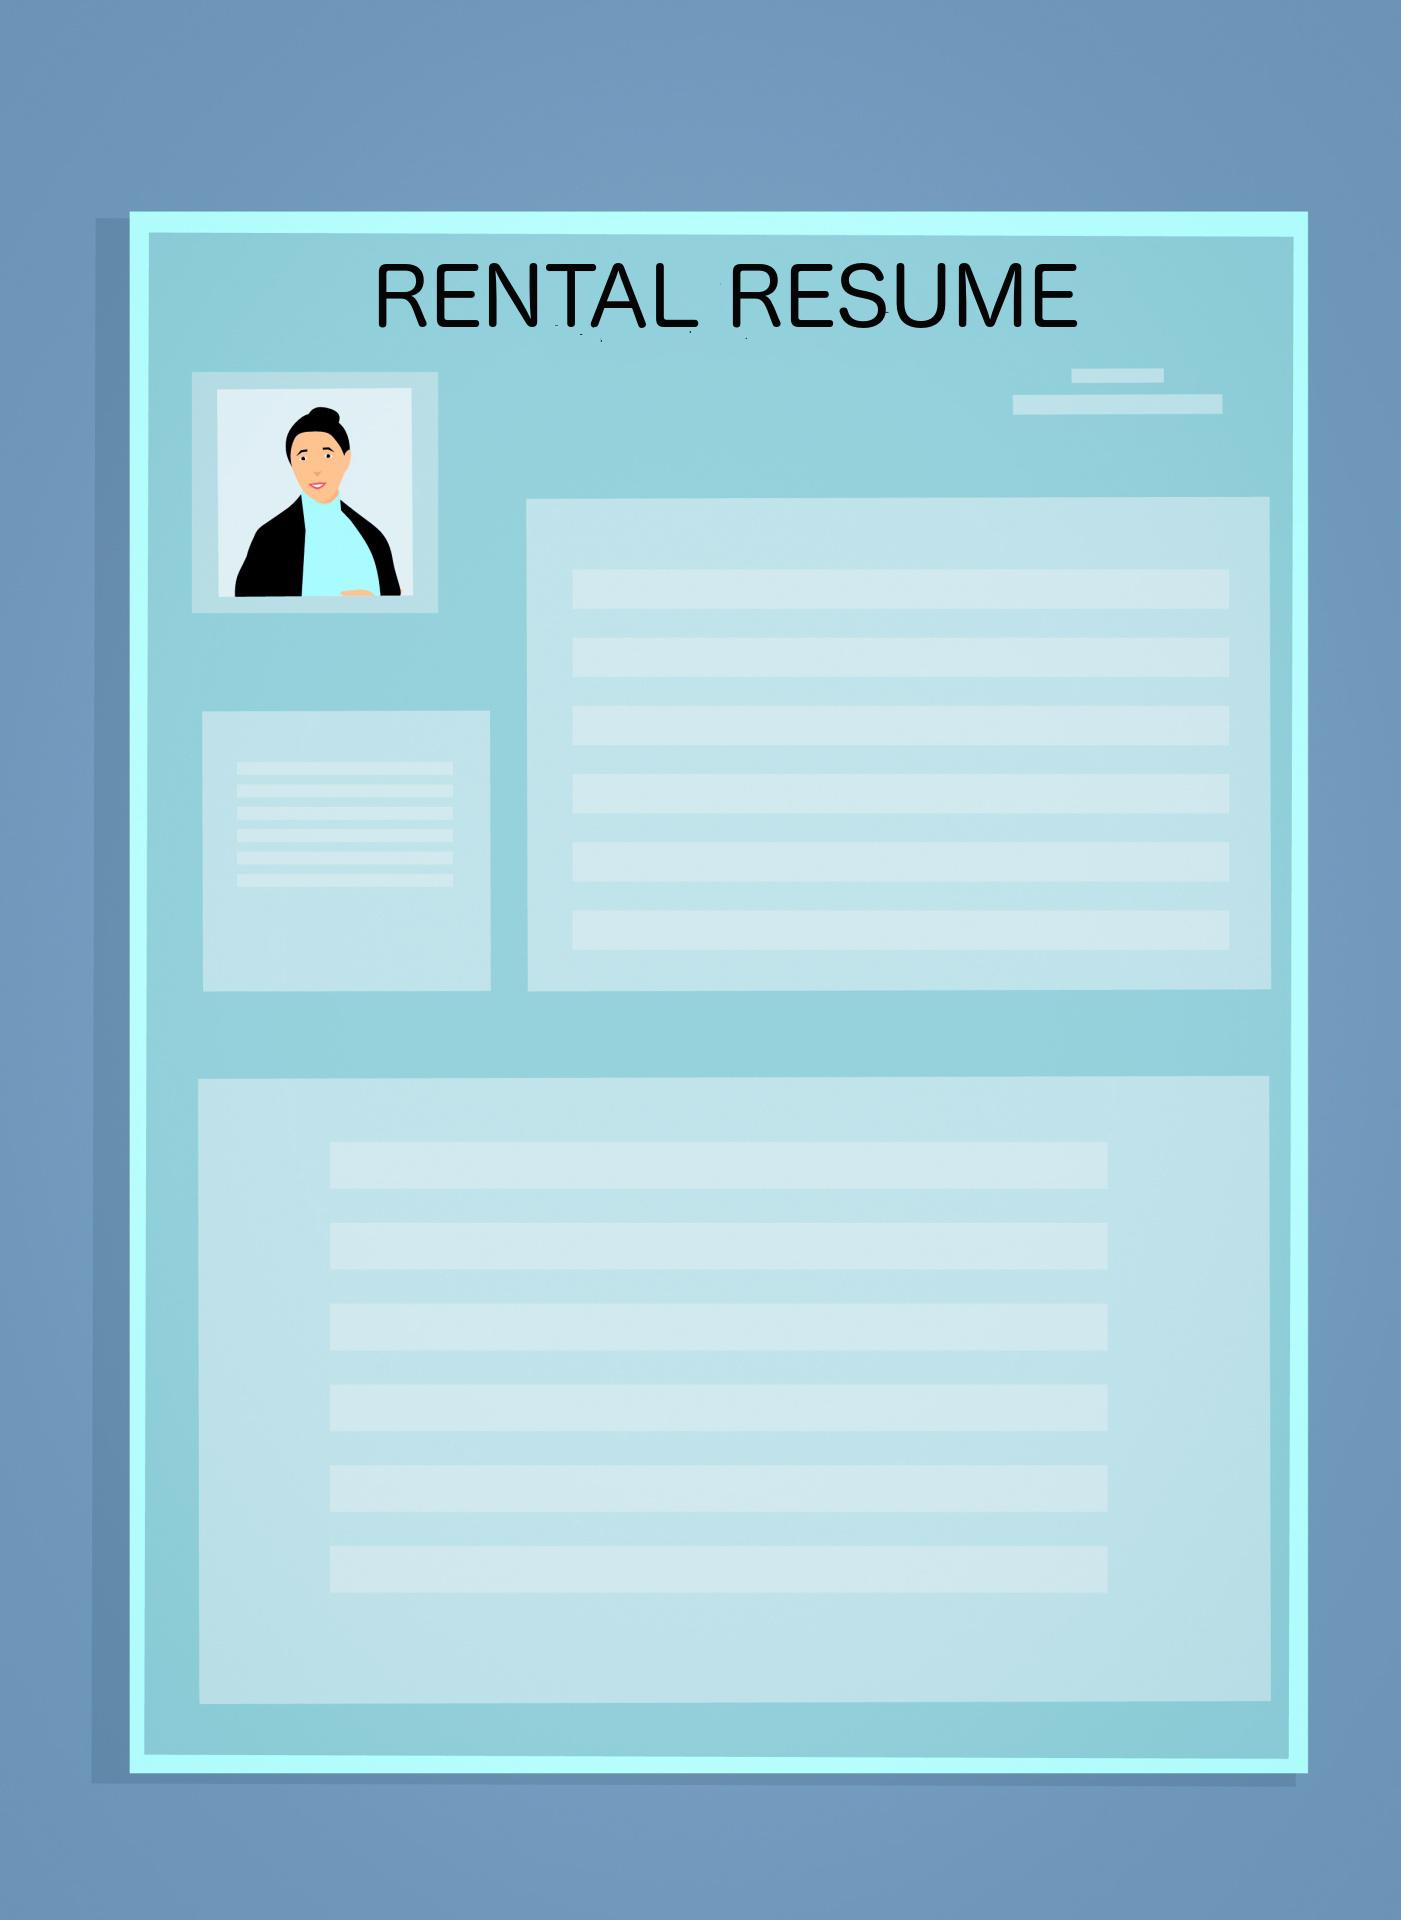 What Rental Resume Looks Like